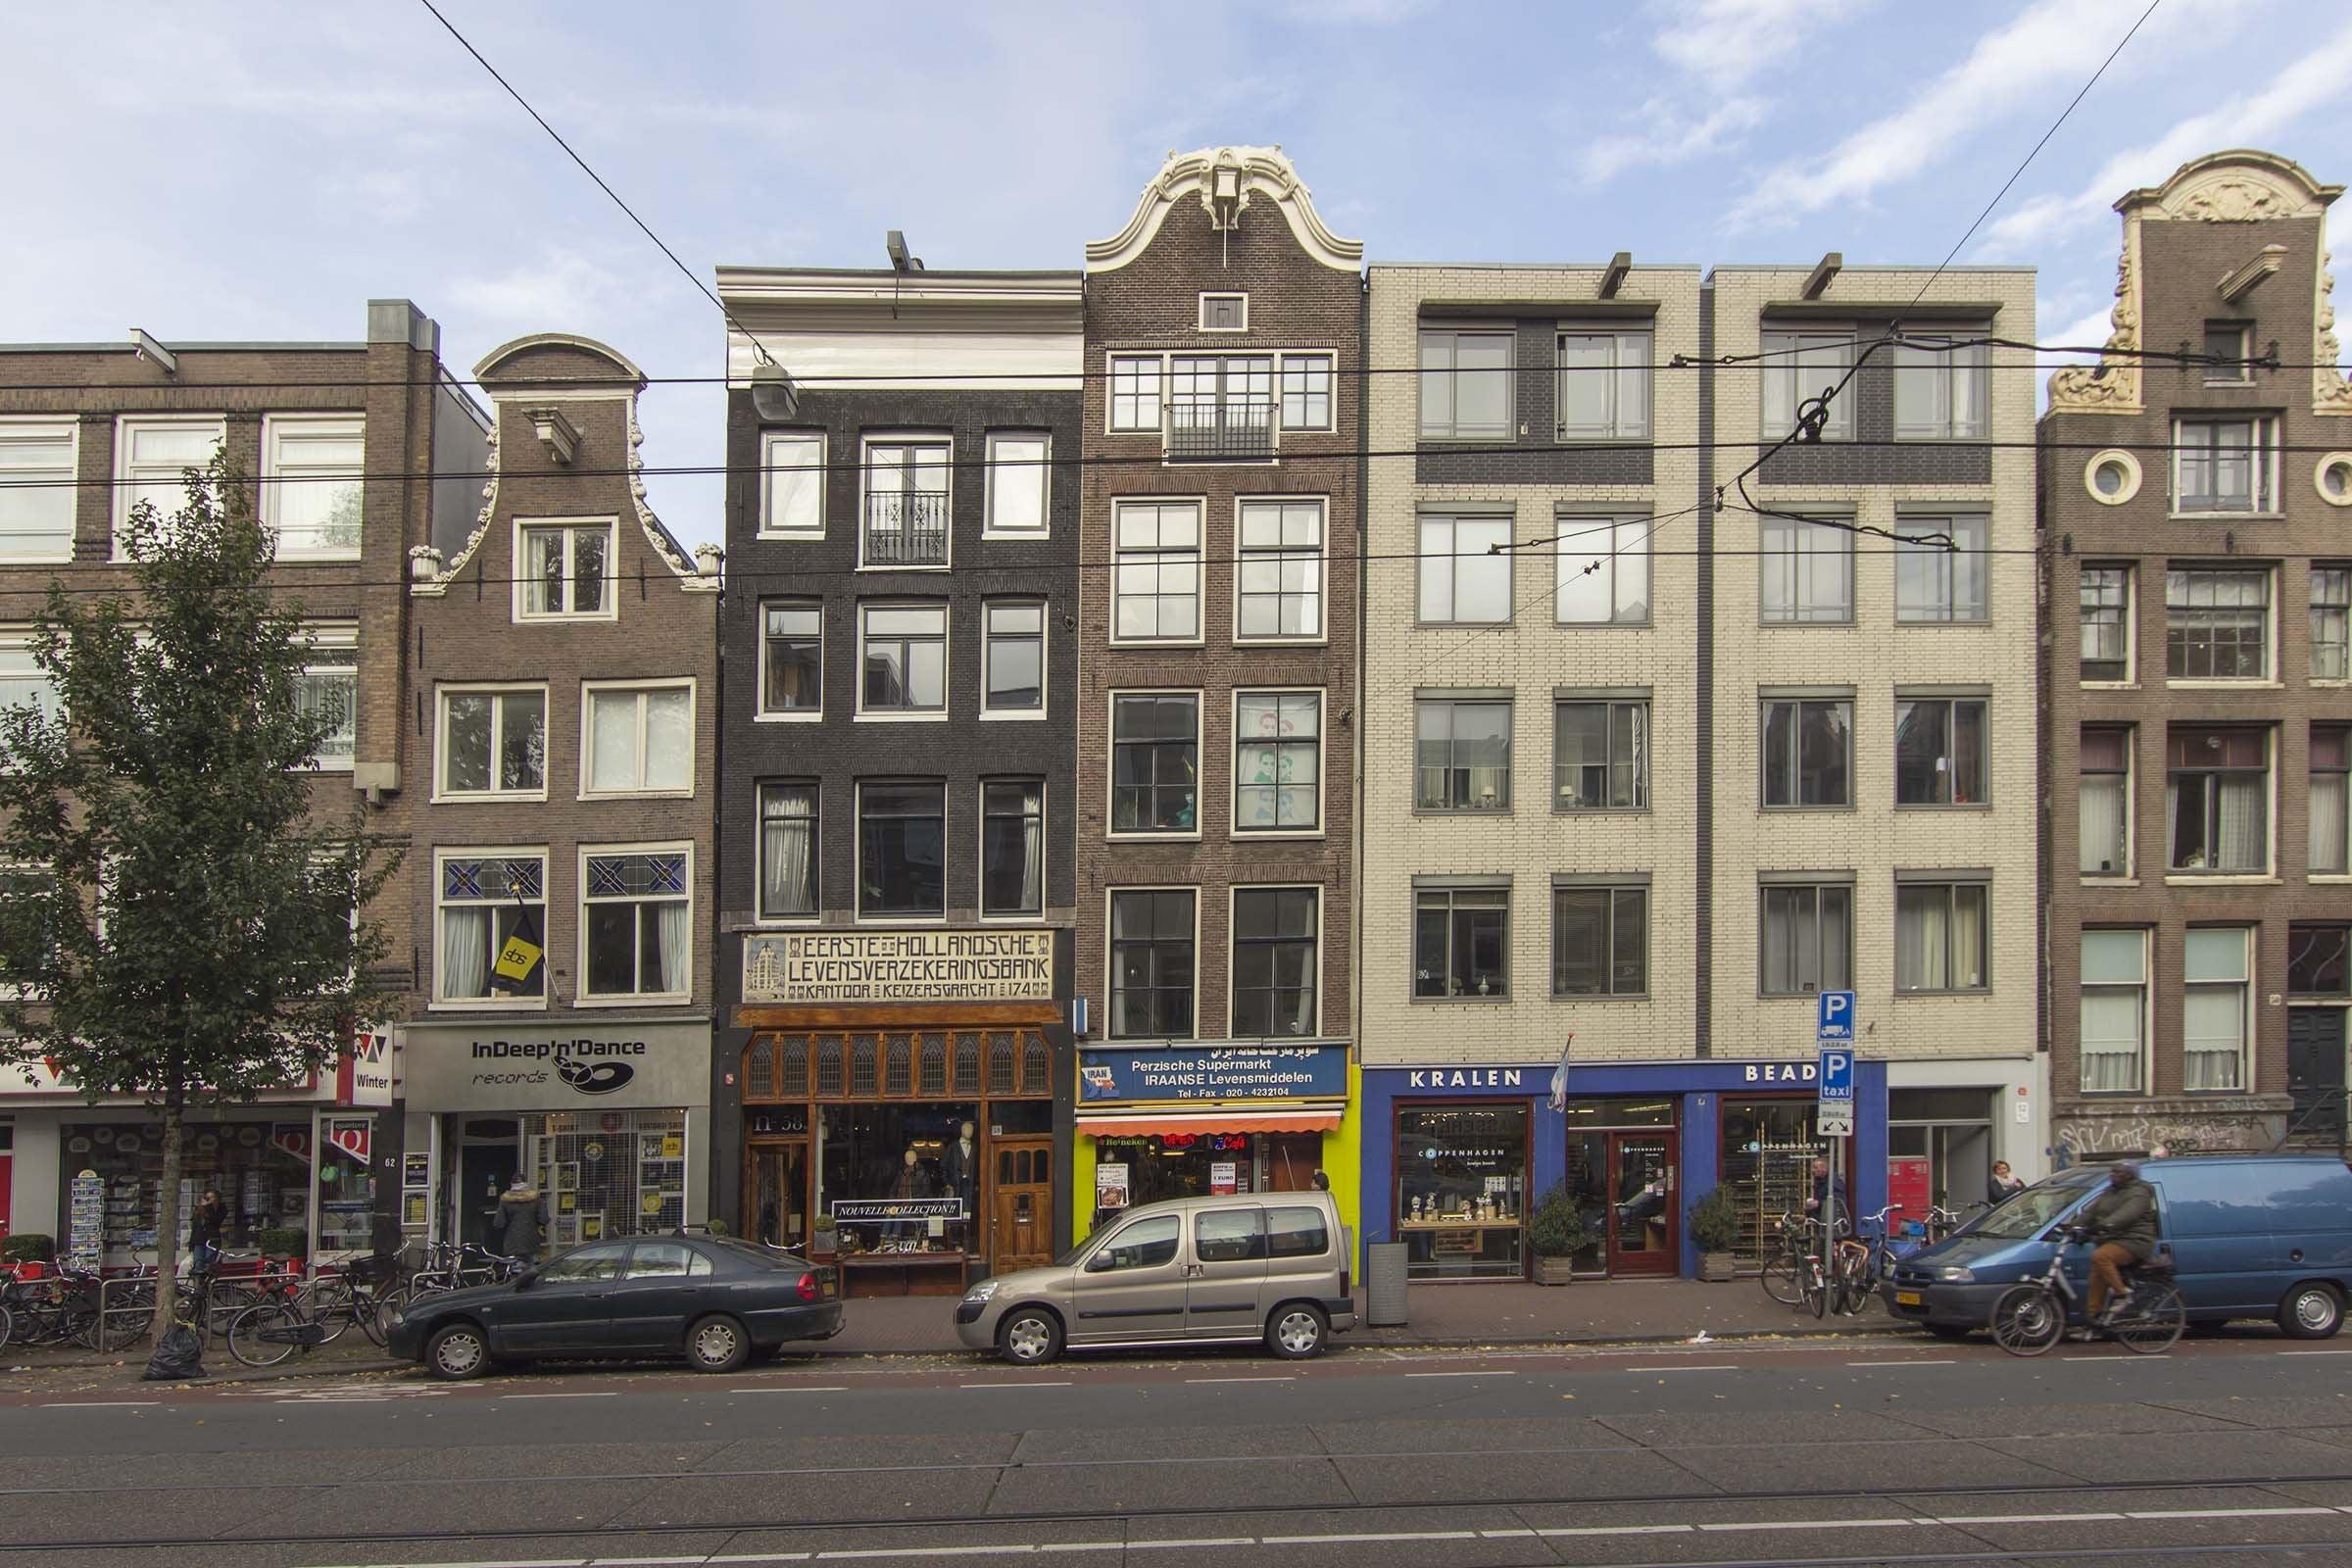 Rozengracht / Amsterdam